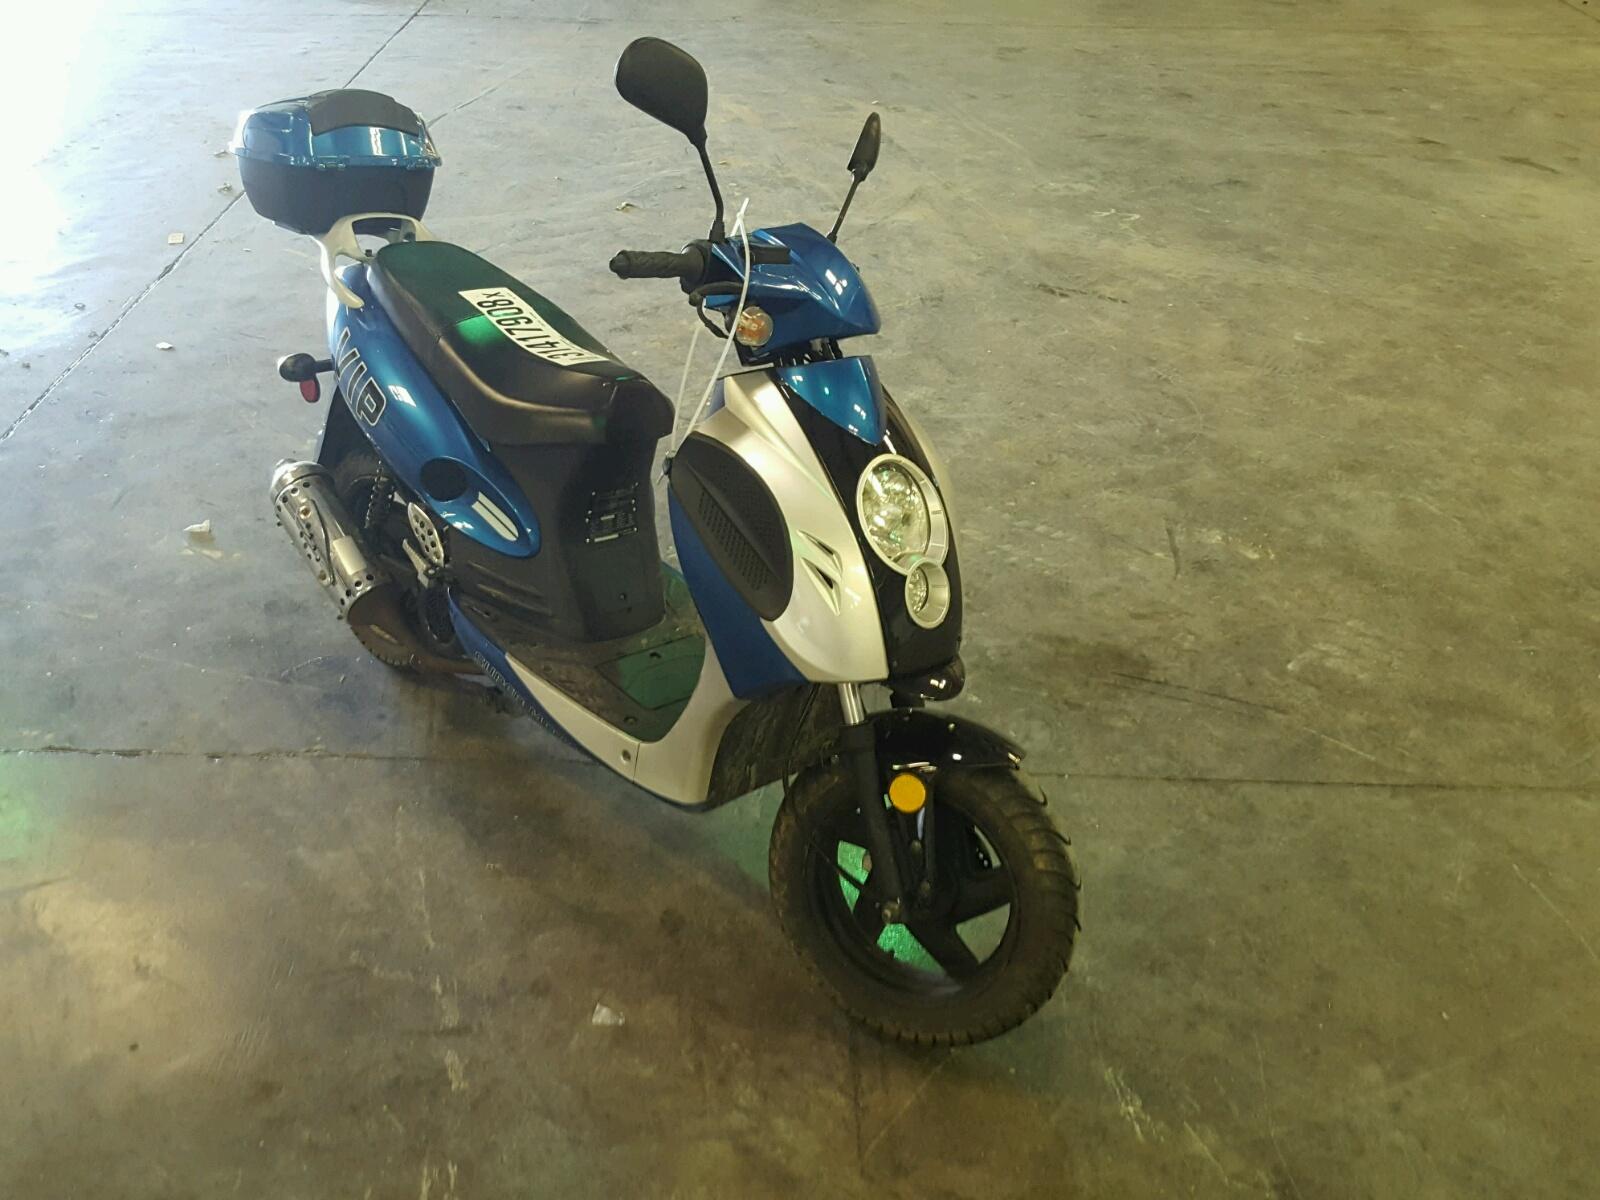 L9ntelkdxd1081736 2013 blue vip scooter on sale in tn nashville l9ntelkdxd1081736 2013 vip scooter left view sciox Gallery